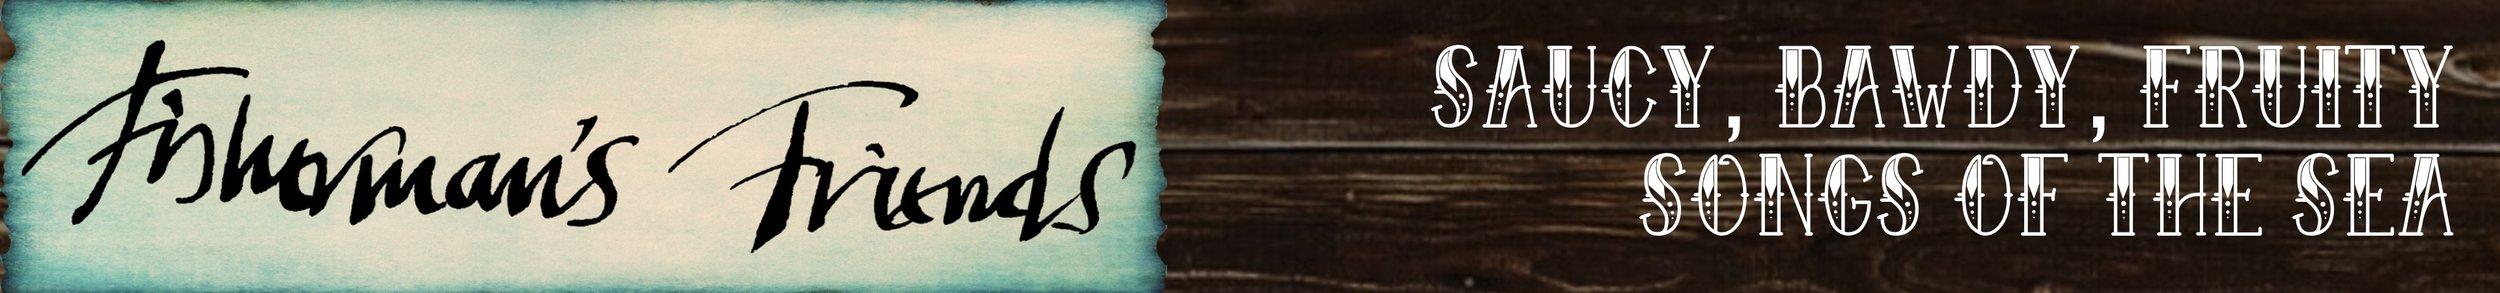 *web banner.jpg